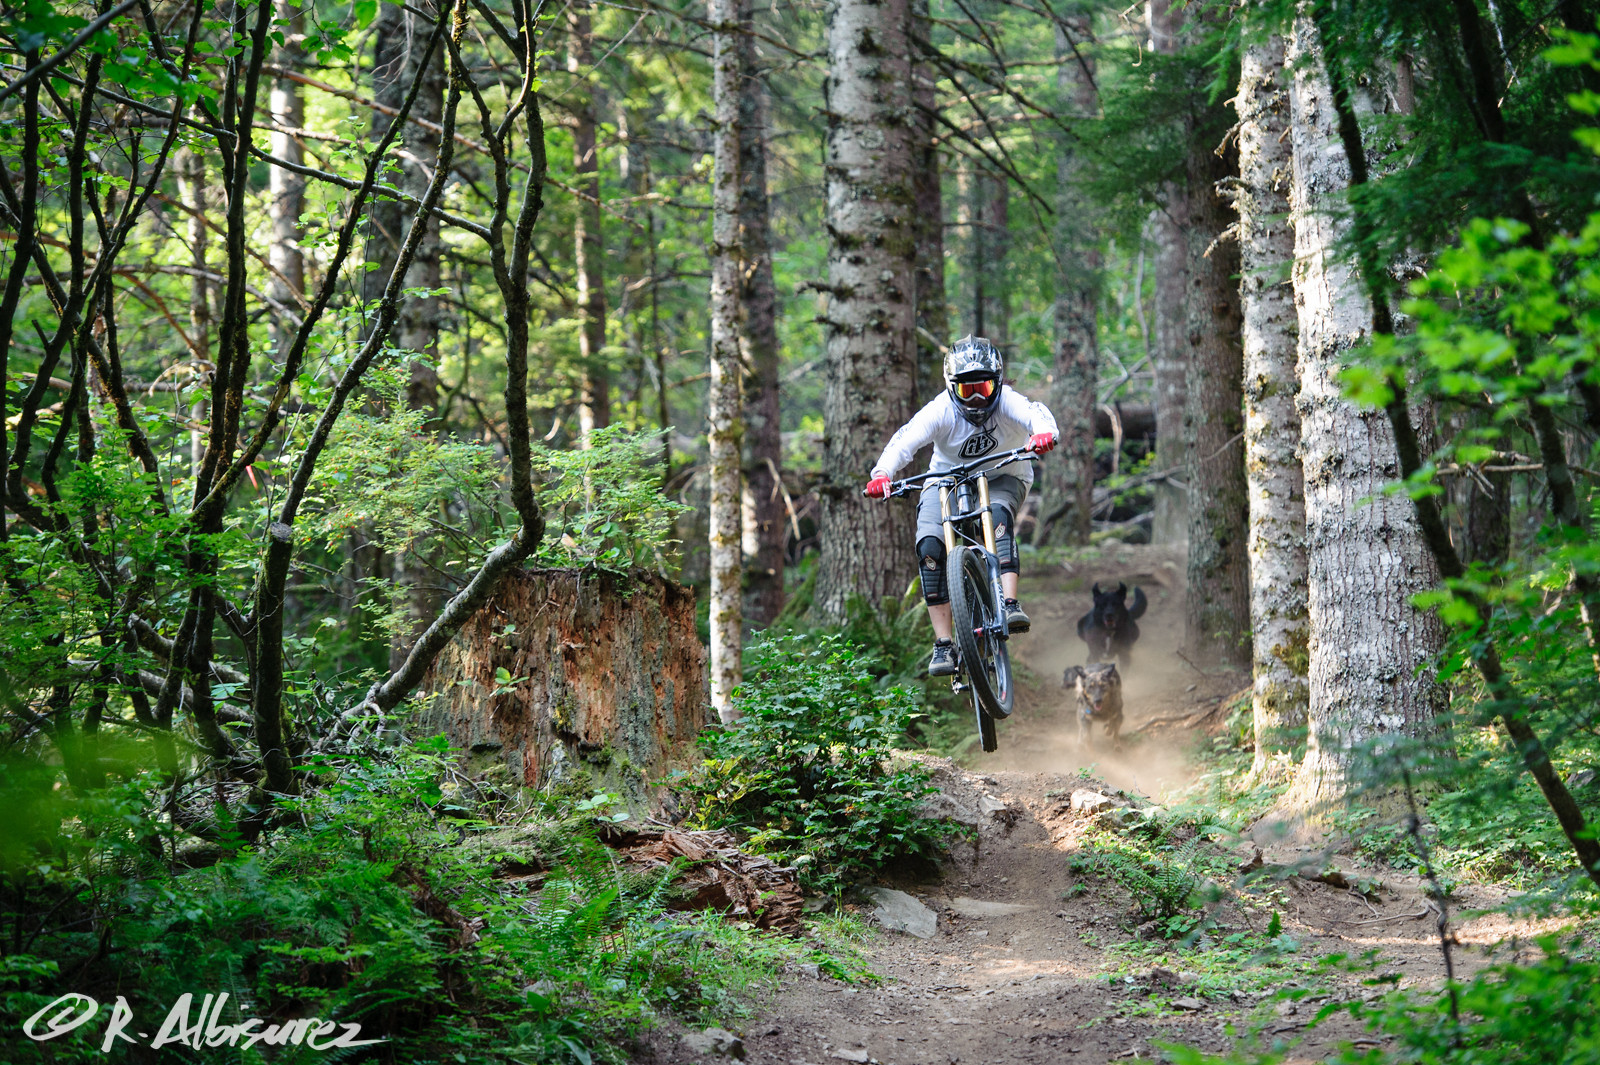 Shred Puppy Heaven - rooshmoo - Mountain Biking Pictures - Vital MTB